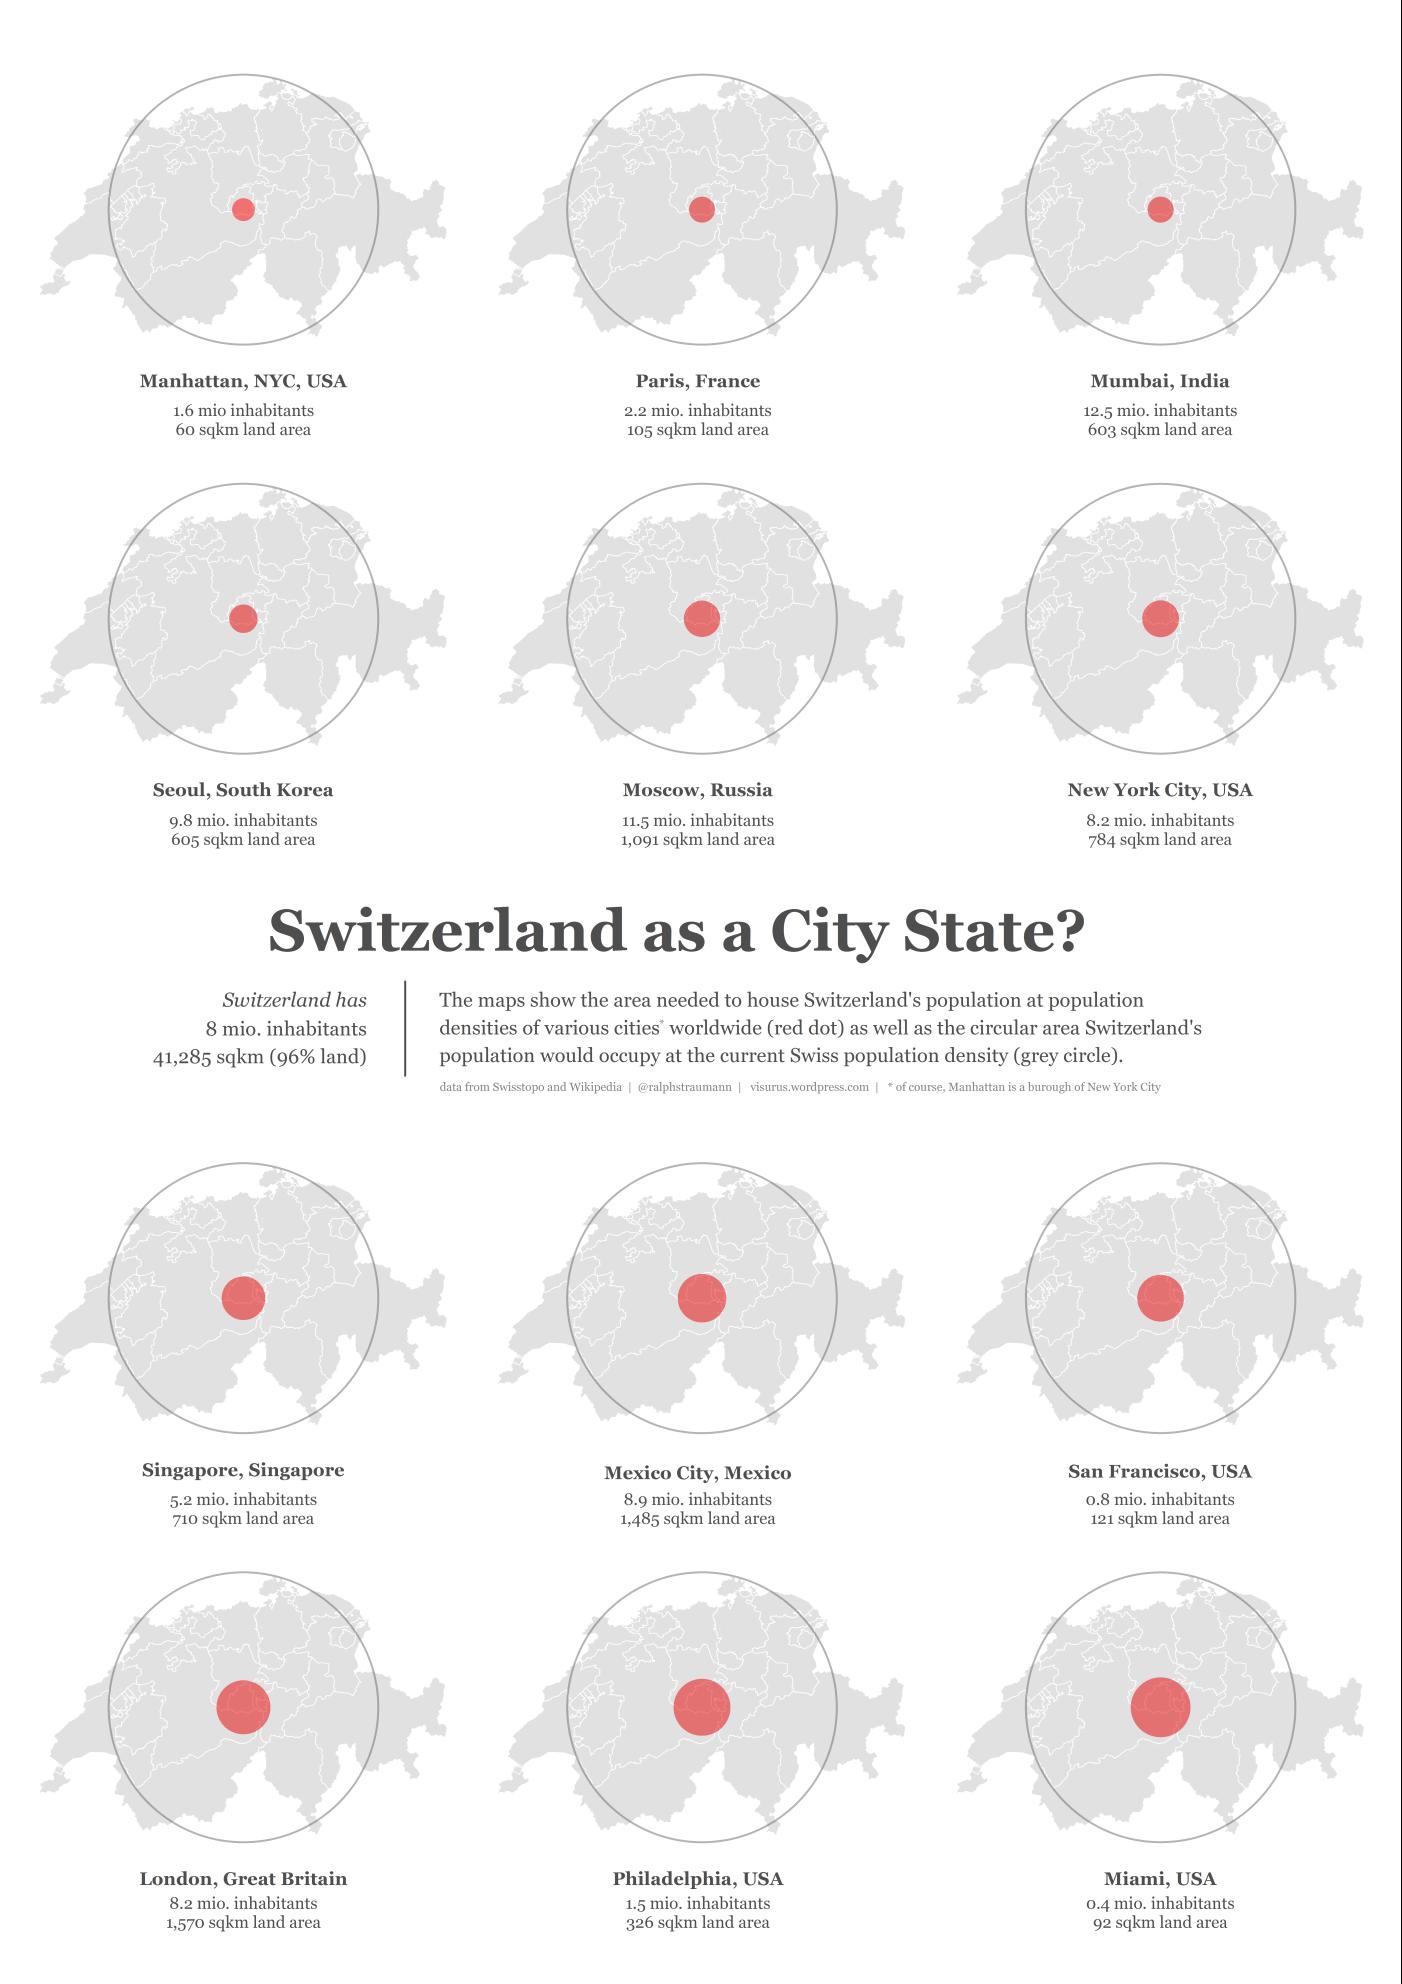 Switzerland as a City State?